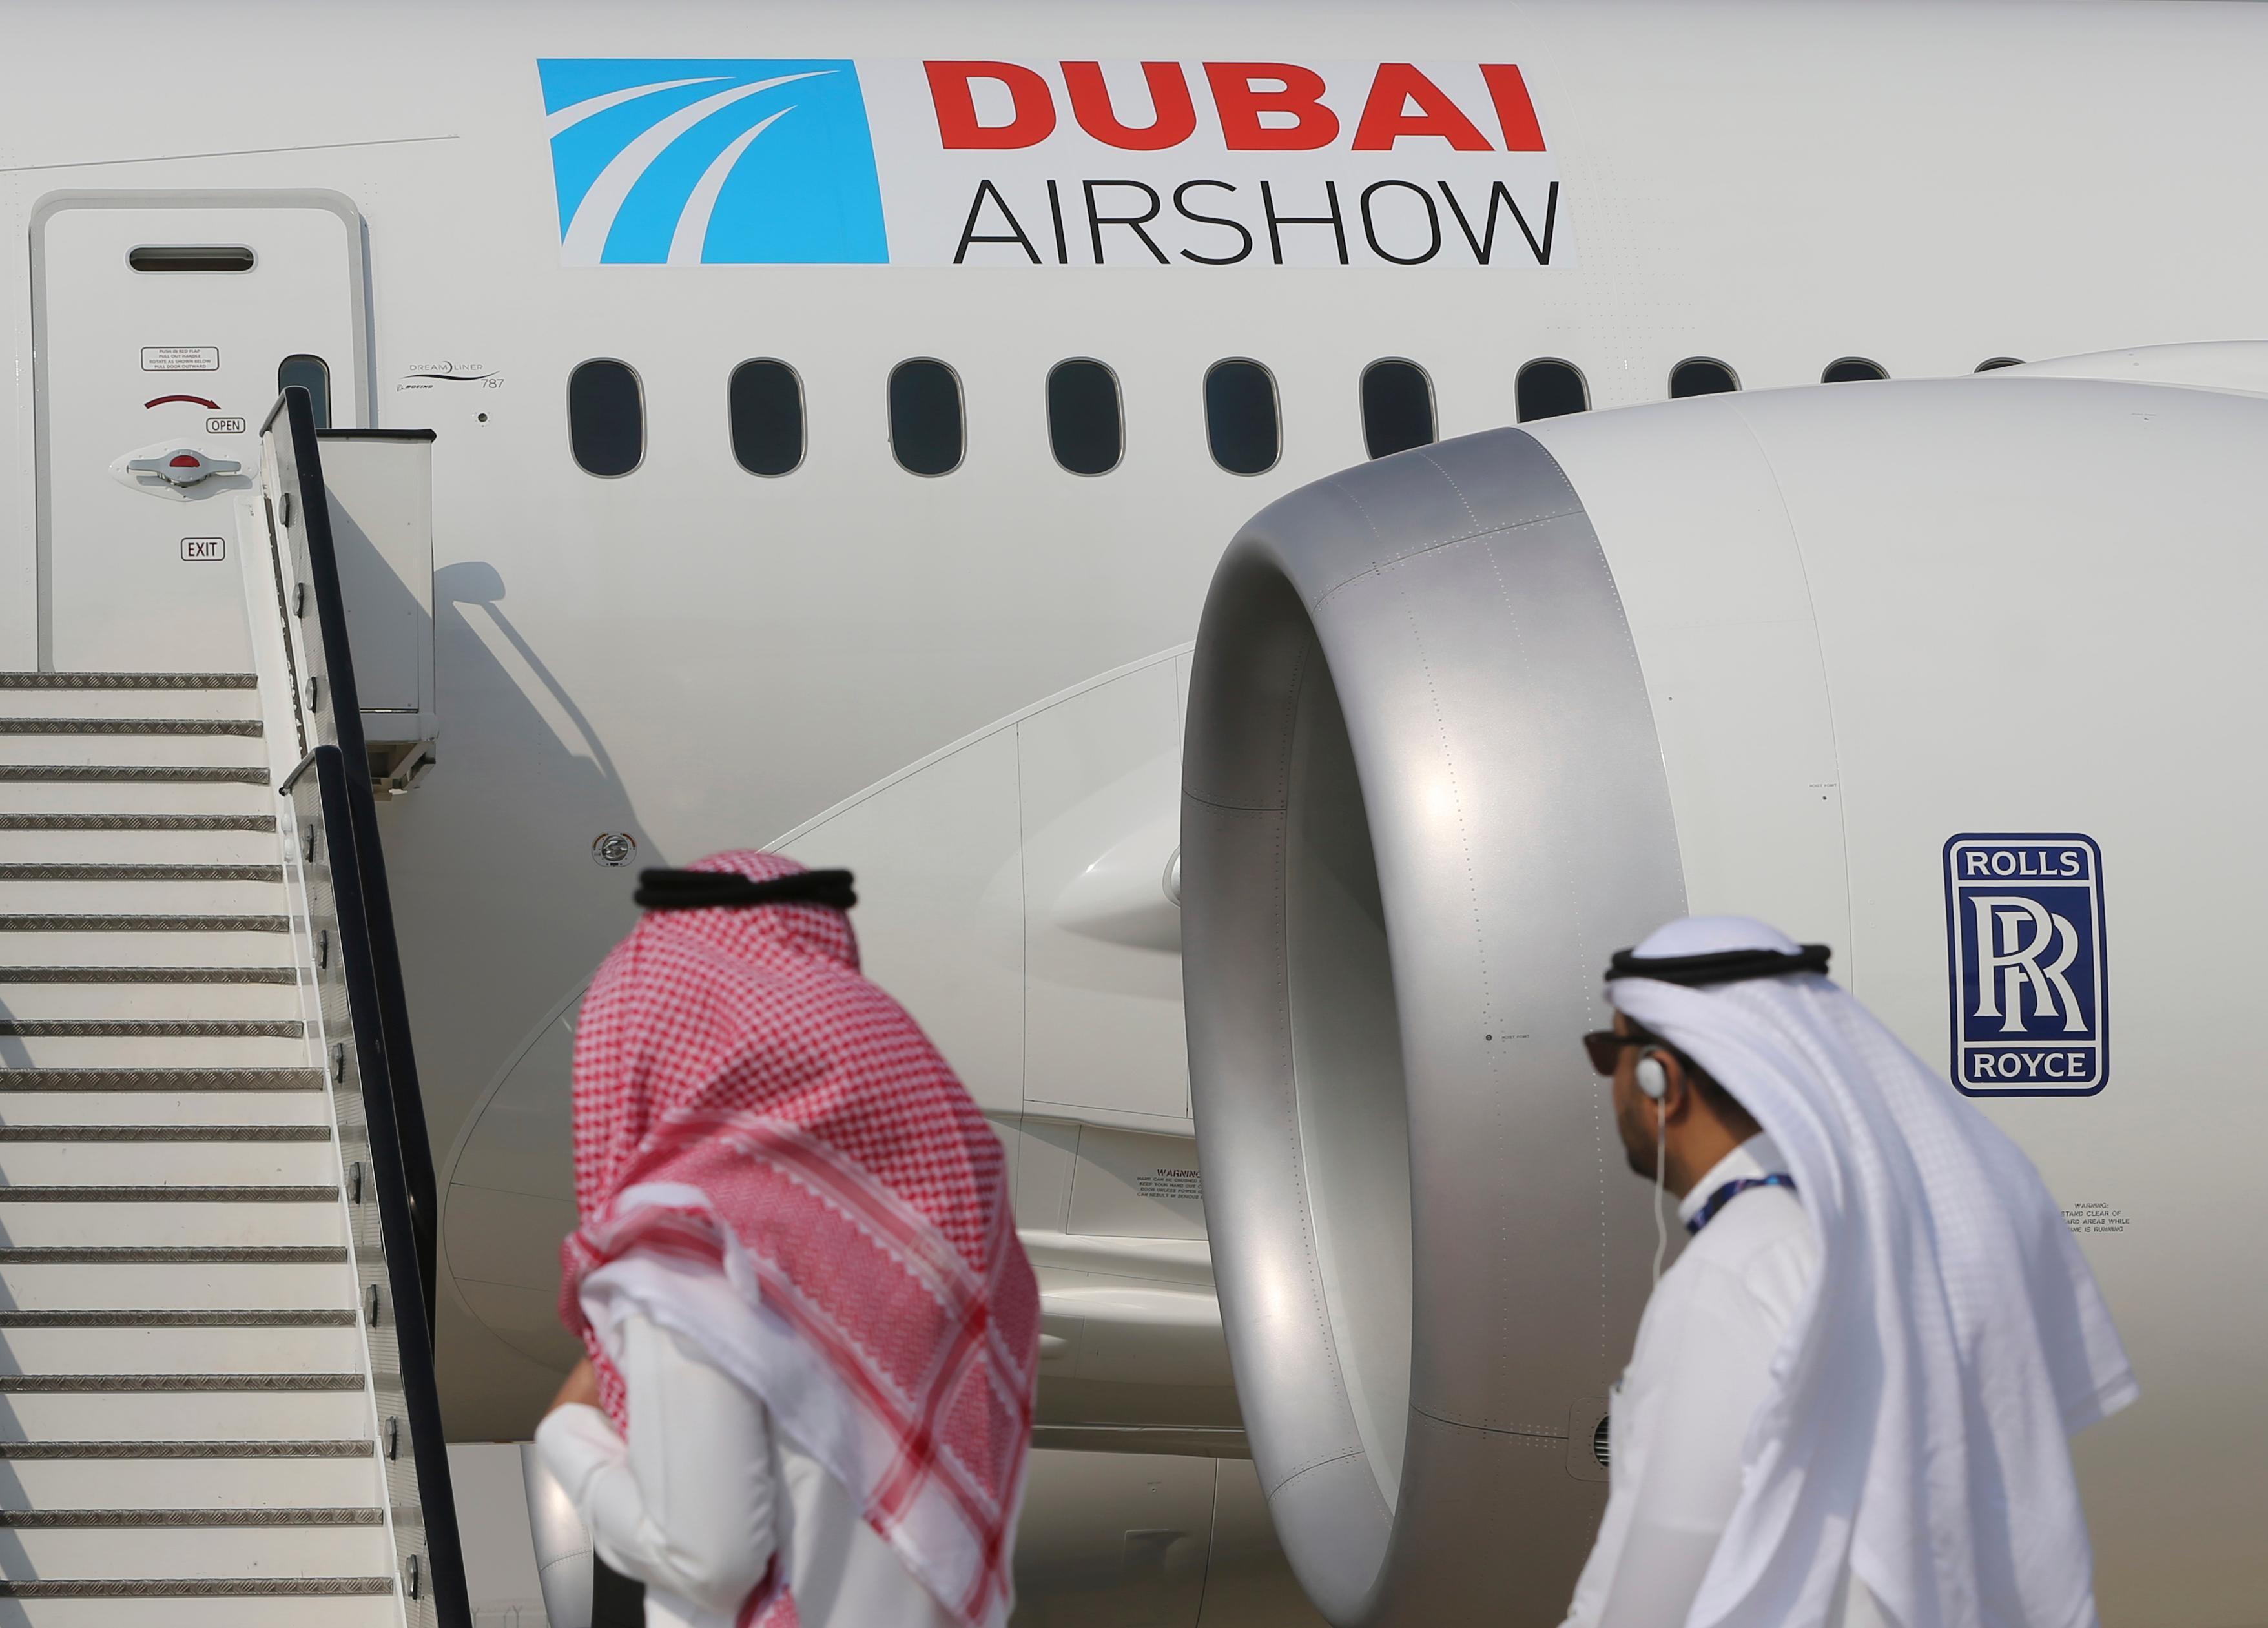 Dubai Airshow - American aircraft manufacturers win big